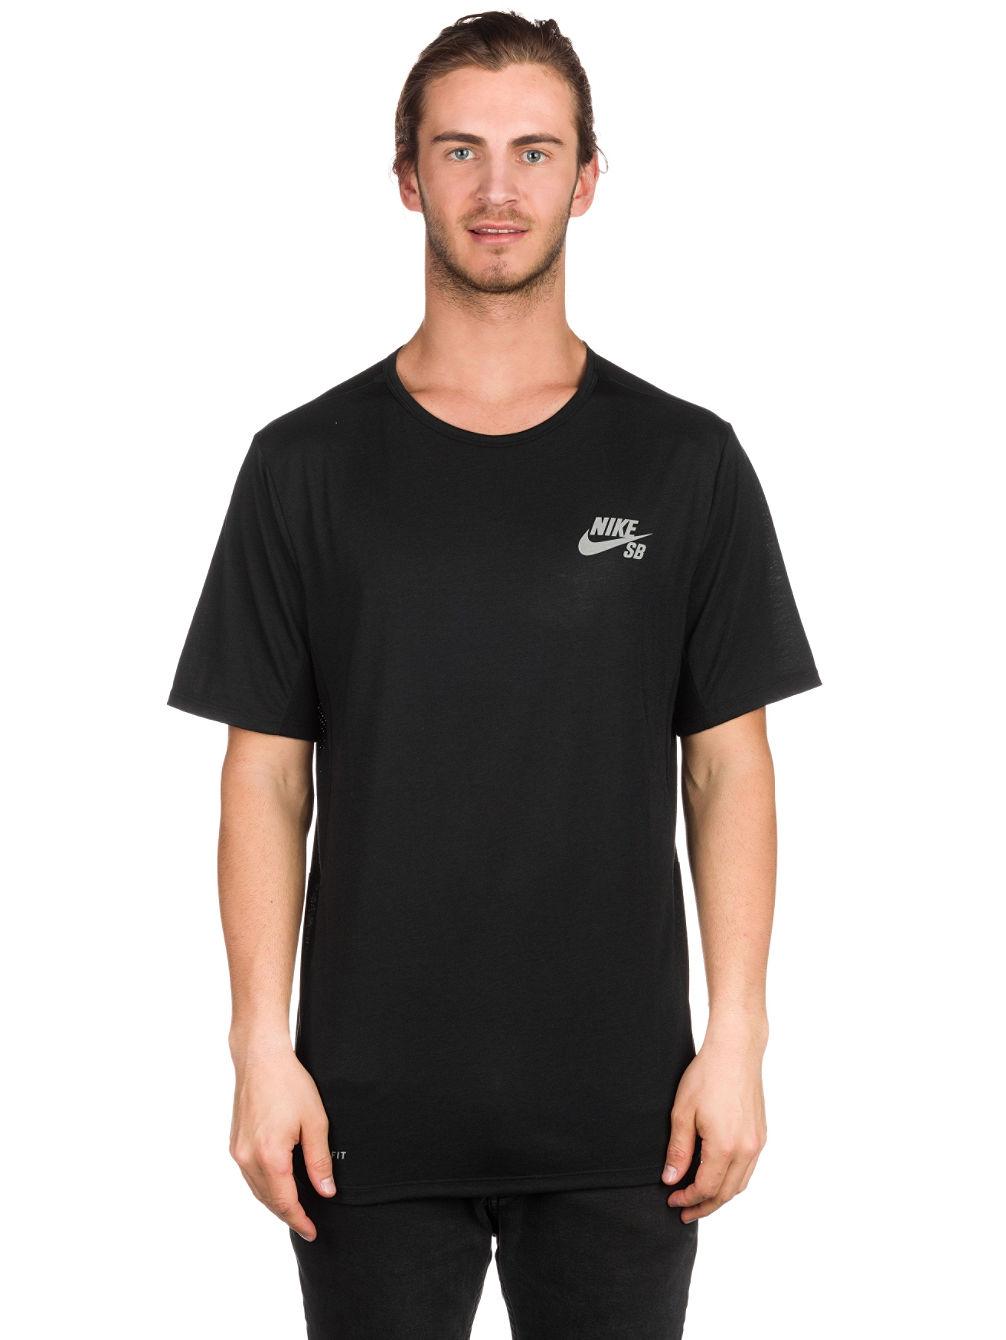 Nike SB Skyline Dri-Fit Cool Ref T-Shirt - nike - blue-tomato.com